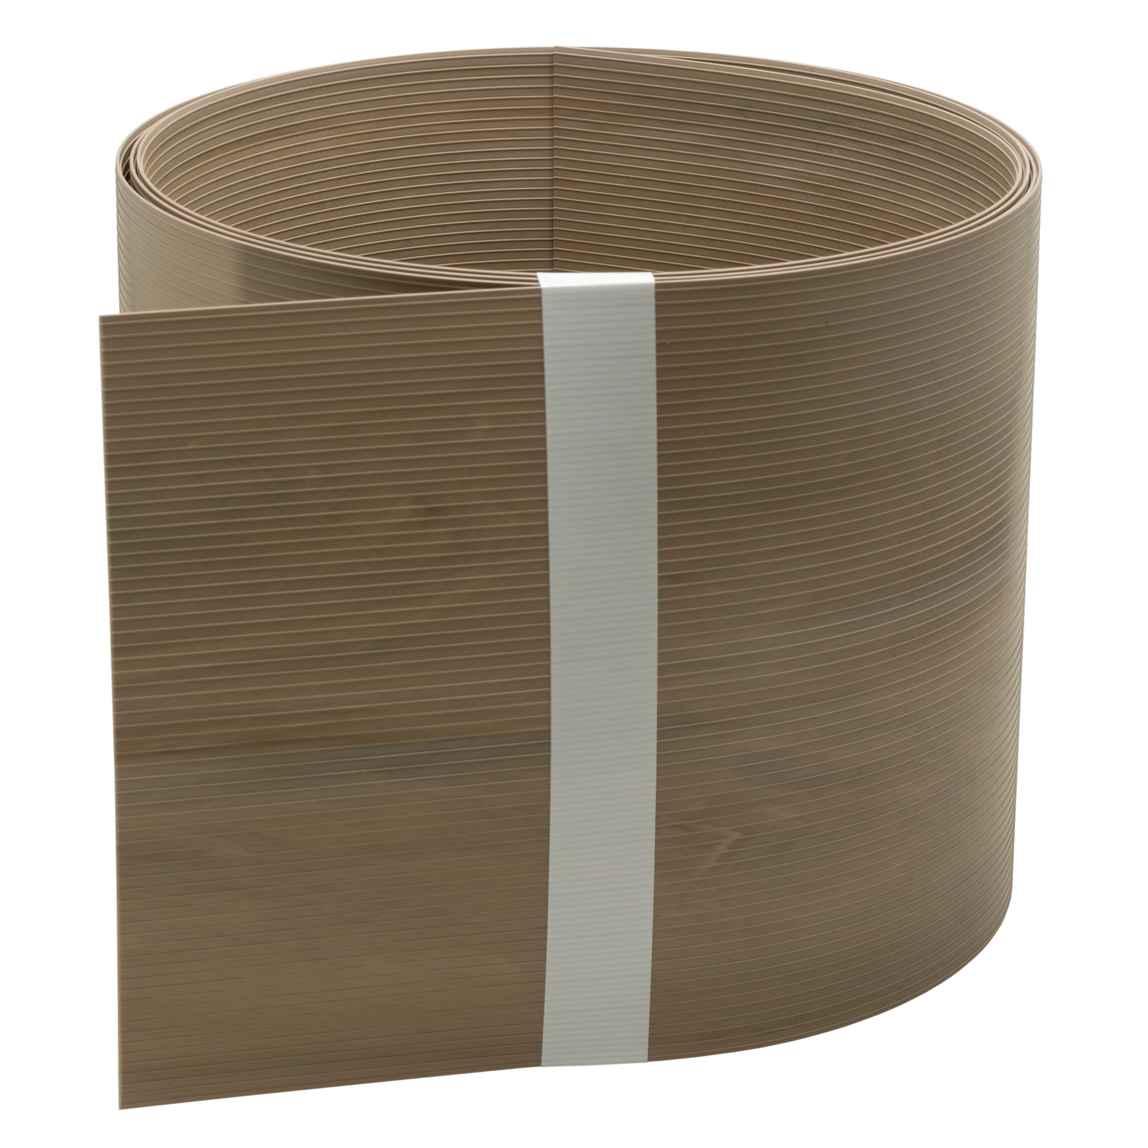 Zaun Sichtschutzstreifen Aus Hart Pvc Holzstruktur Caramel Oak